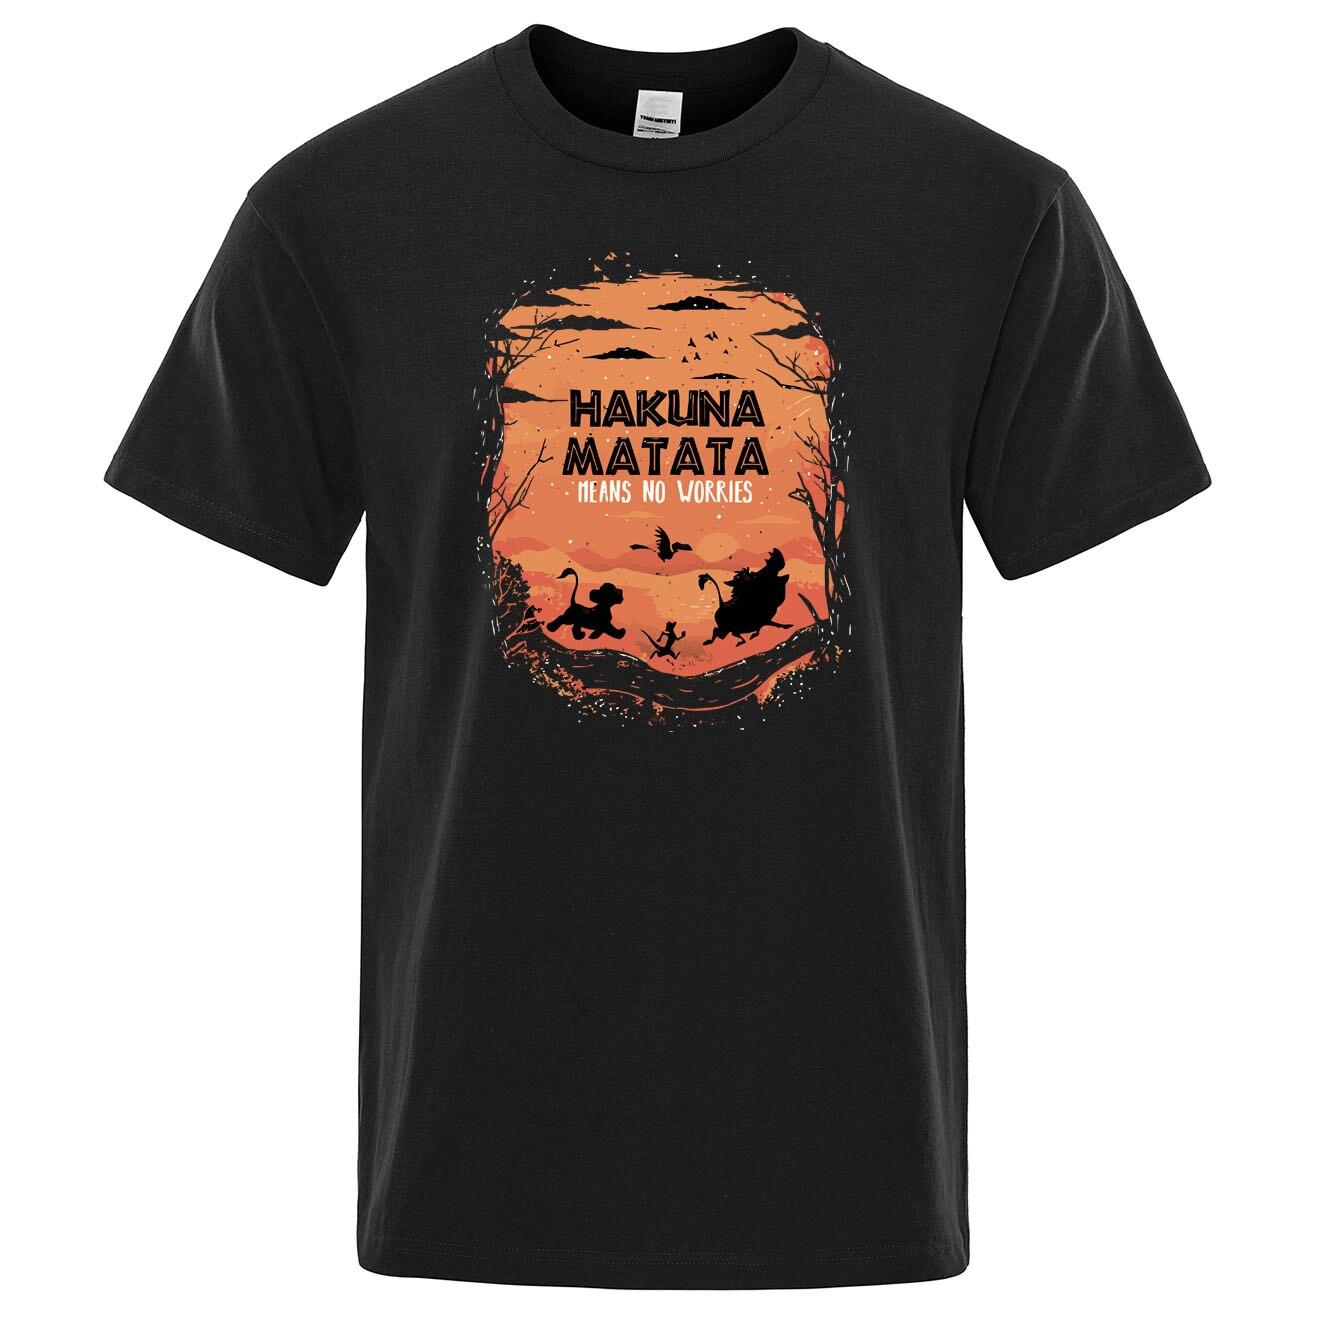 The Lion King Hakuna Matata T Shirts Men Simba's Friend Pumbaa Timon Tops Summer Tshirt Funny Print Tee Shirts Mens Cool T-shirt